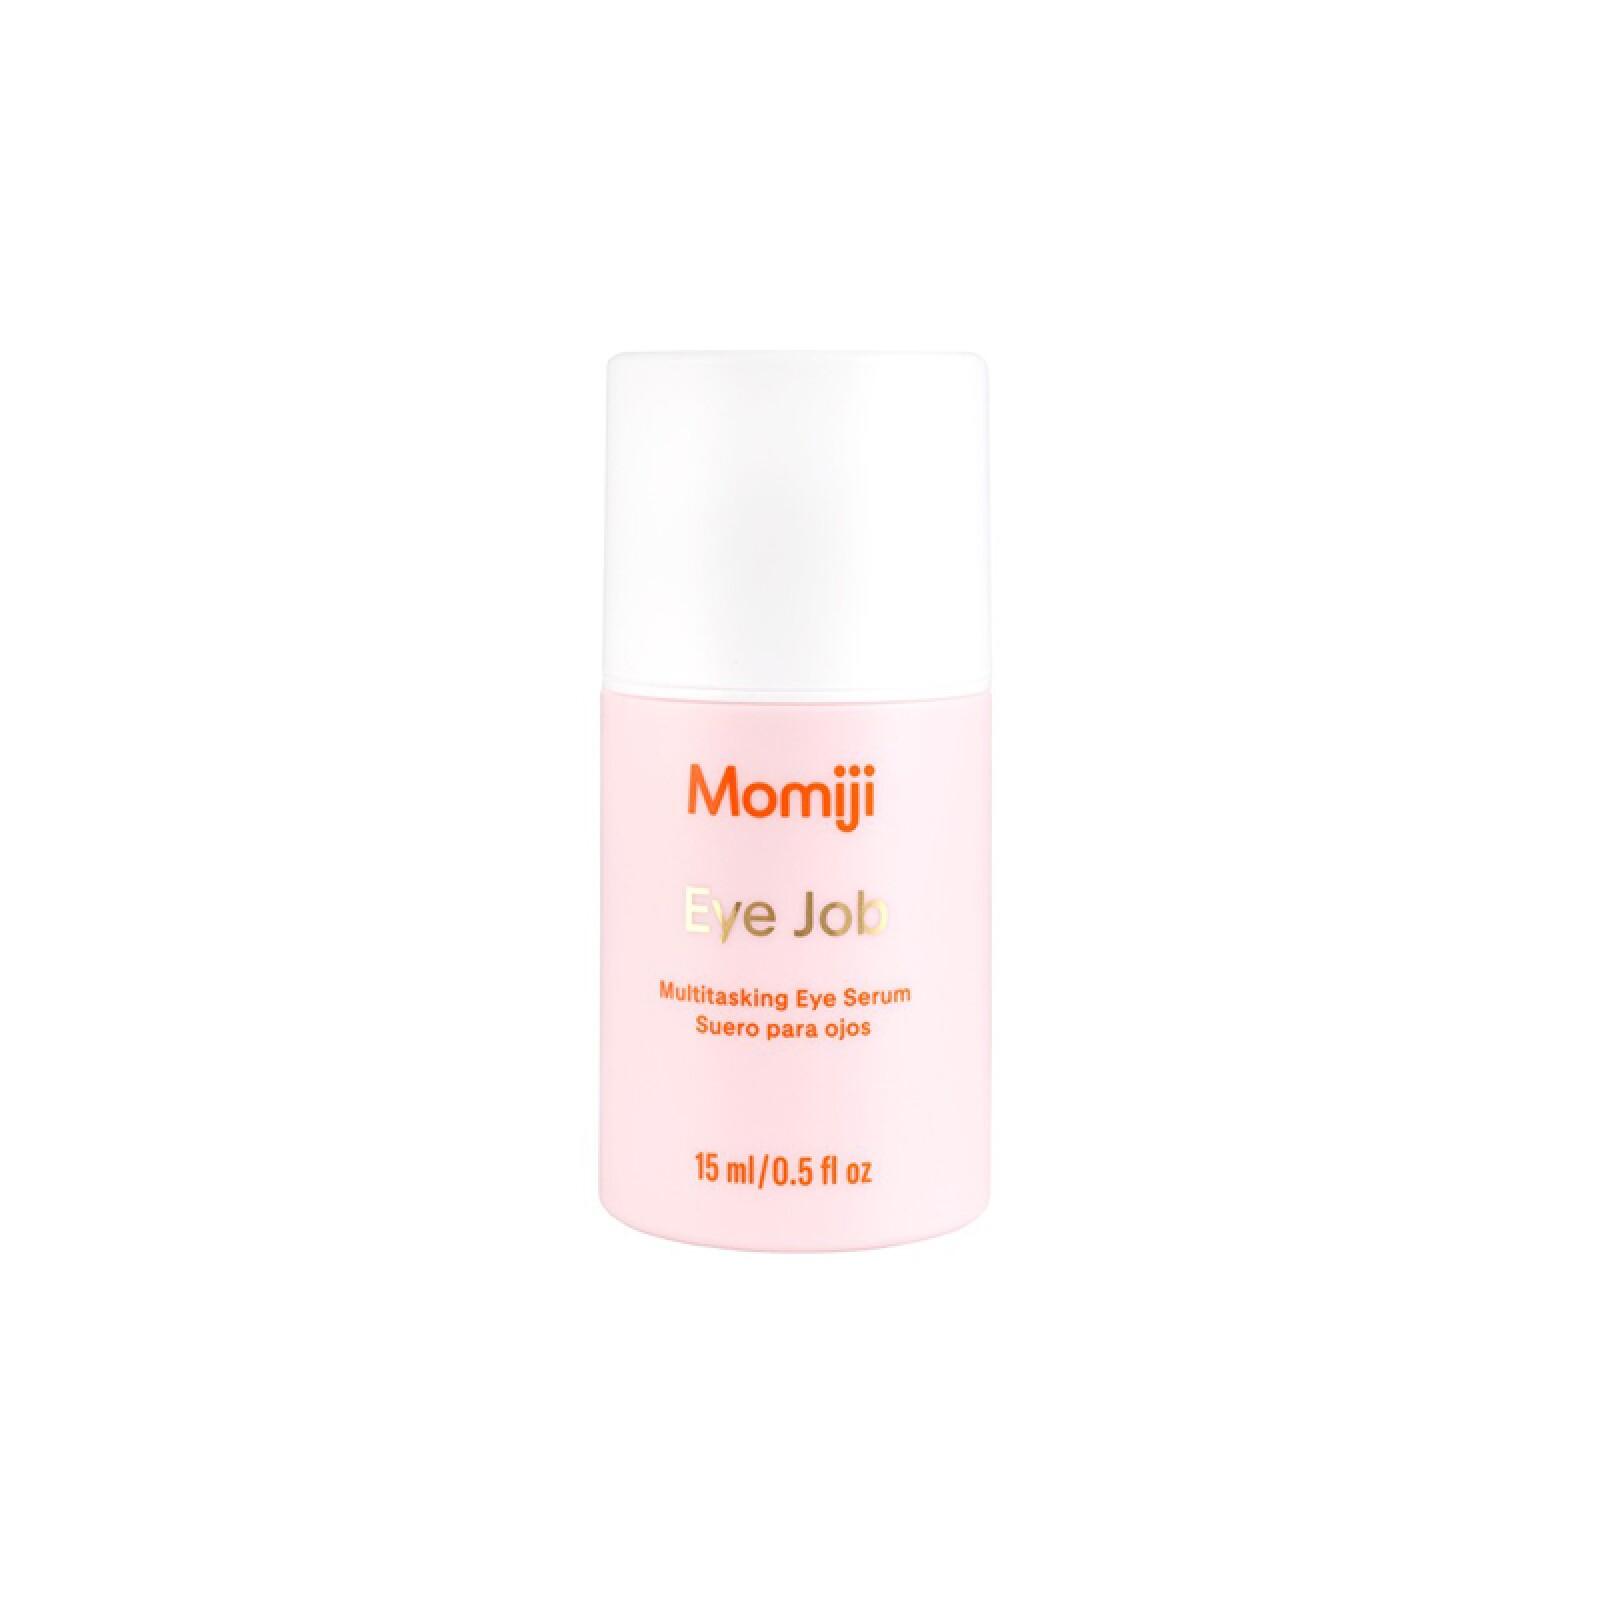 Momiji Life Eye Job ($590, momijibeauty.com) Momiji Life Eye Job ($590, momijibeauty.com)